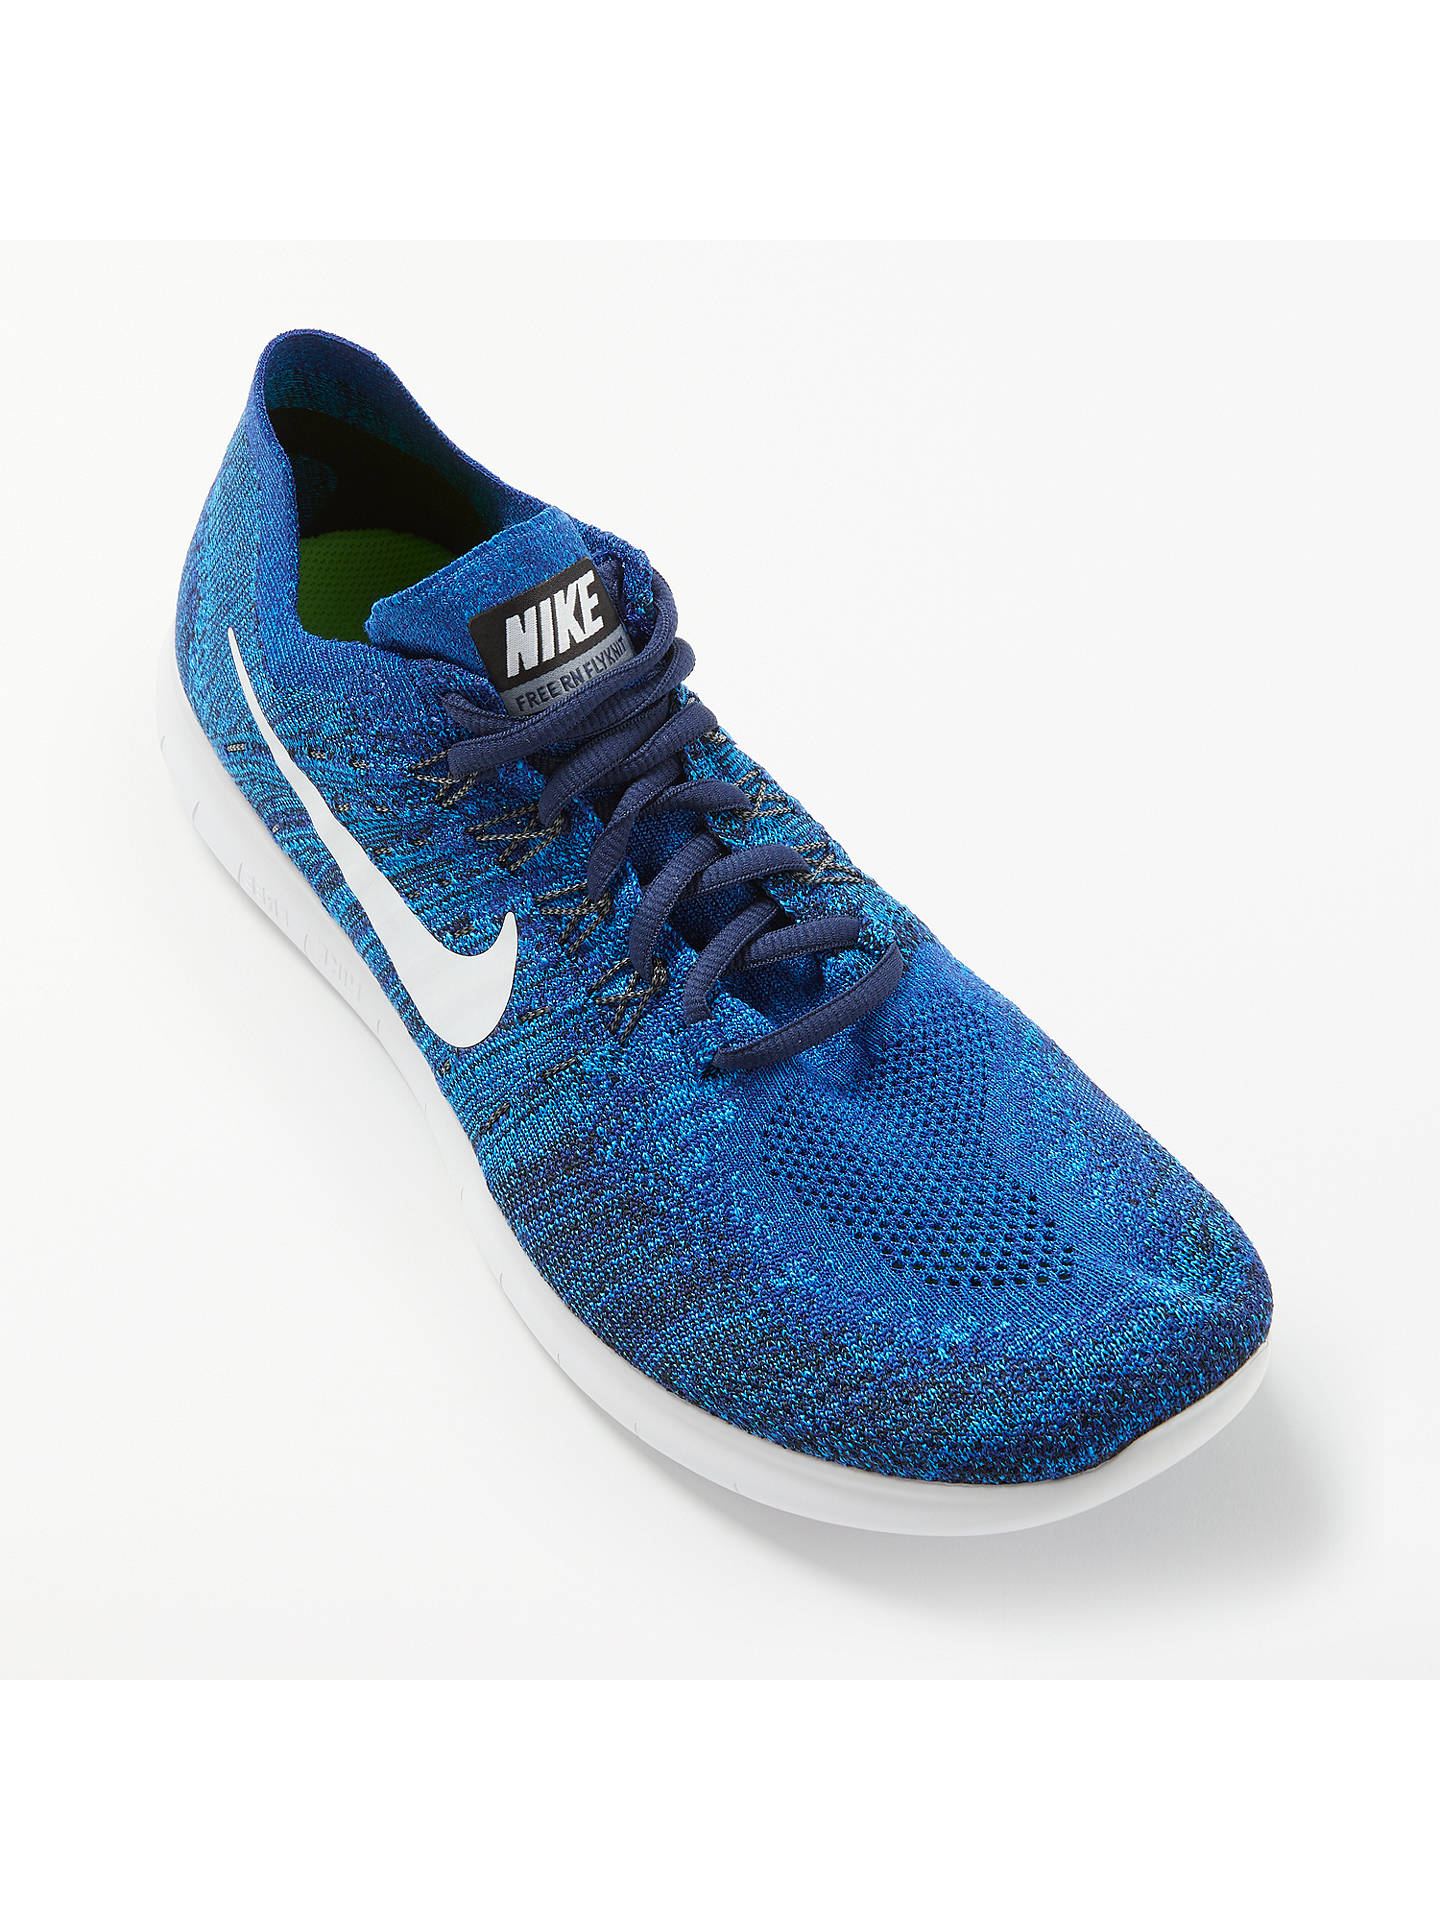 best website 9f891 65973 ... Buy Nike Free RN Flyknit 2017 Men s Running Shoes, Royal Blue Wolf  Grey, ...